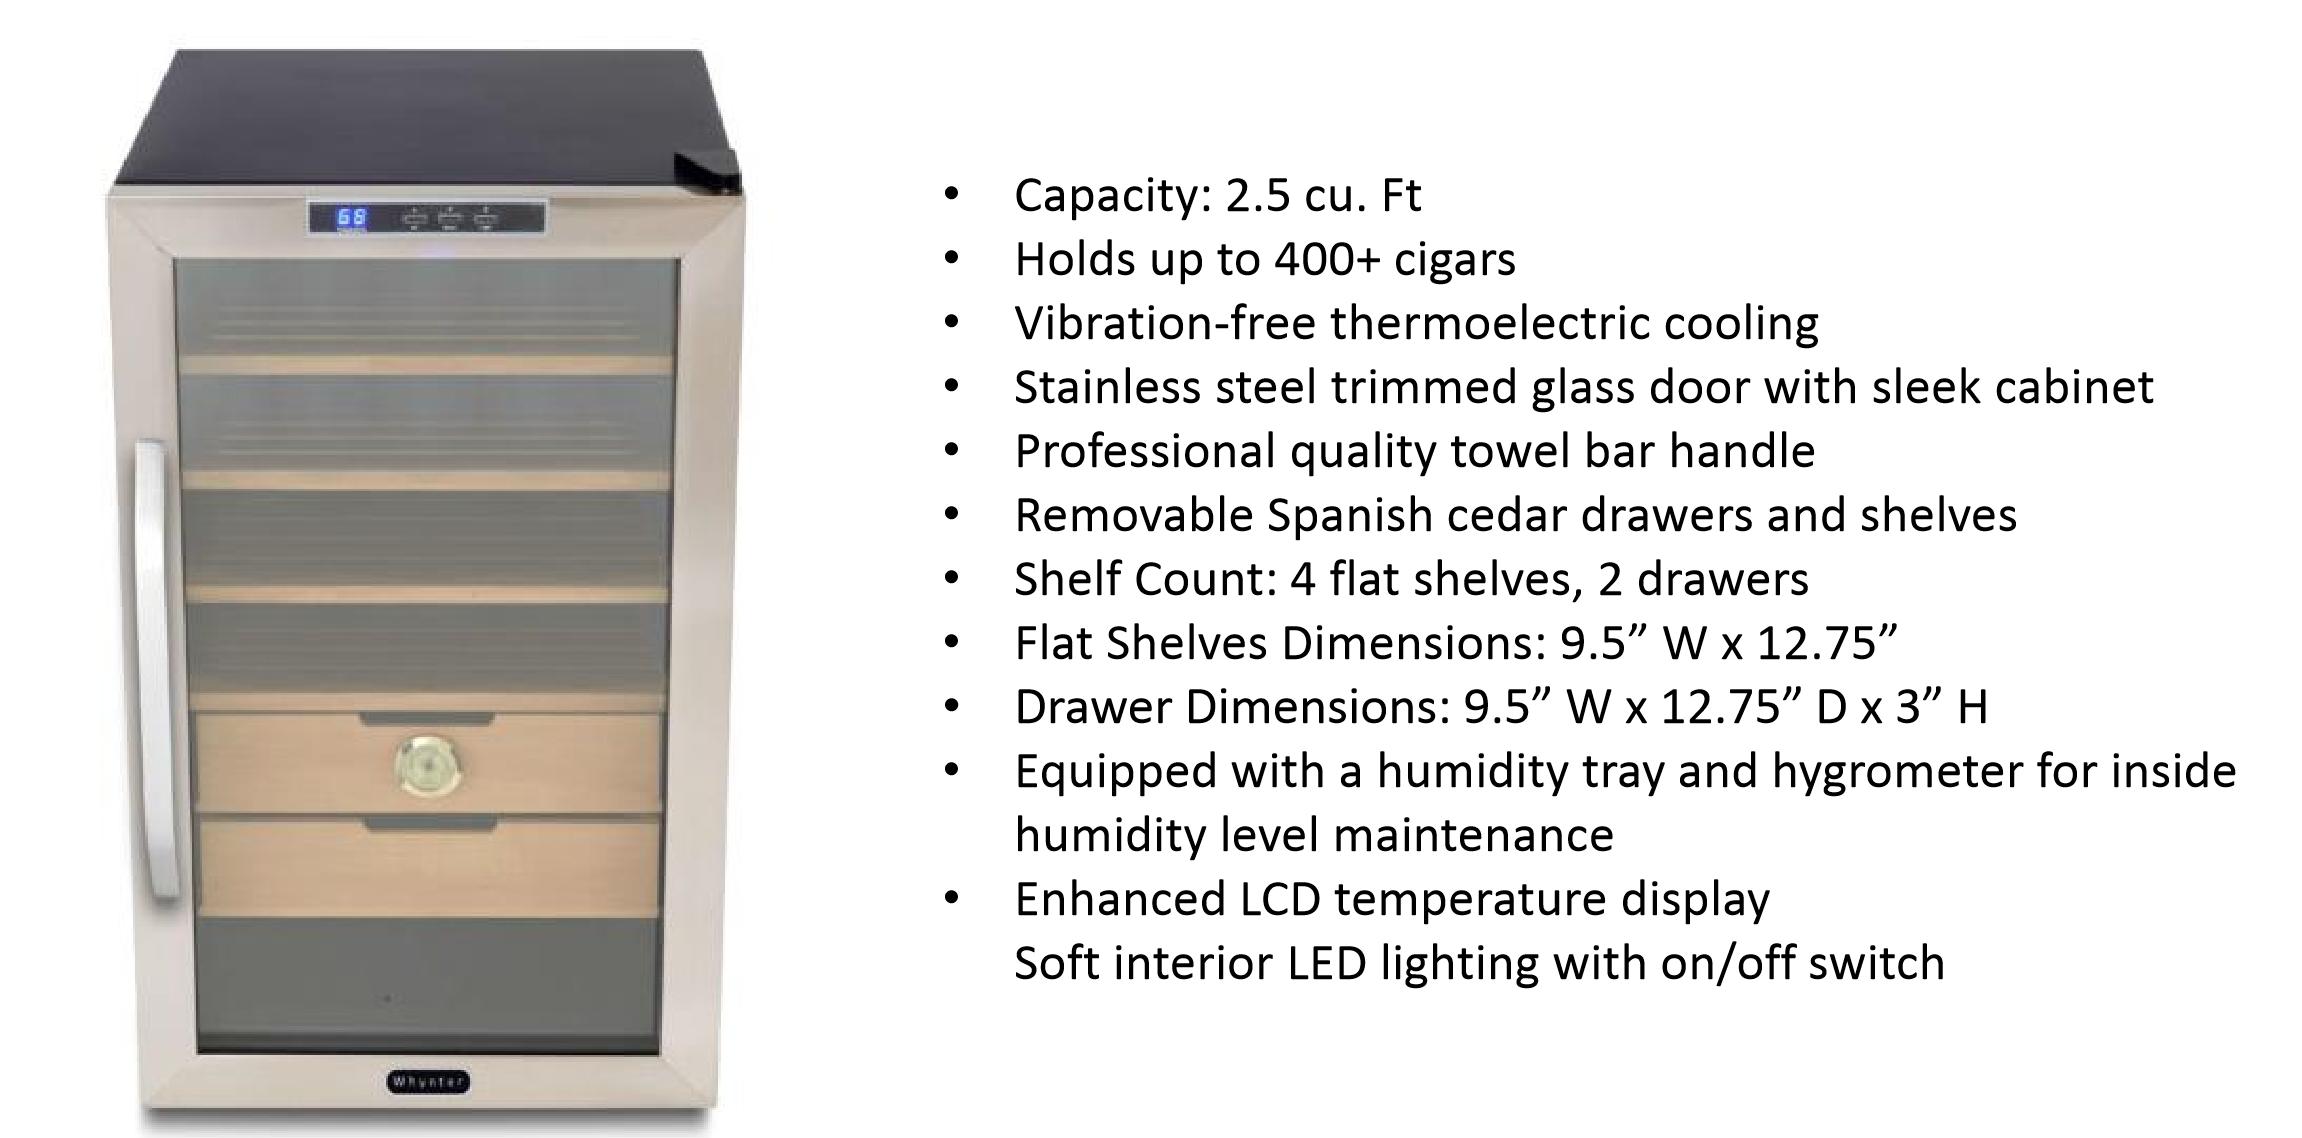 You could win this Montecristo Cigar Cooler!